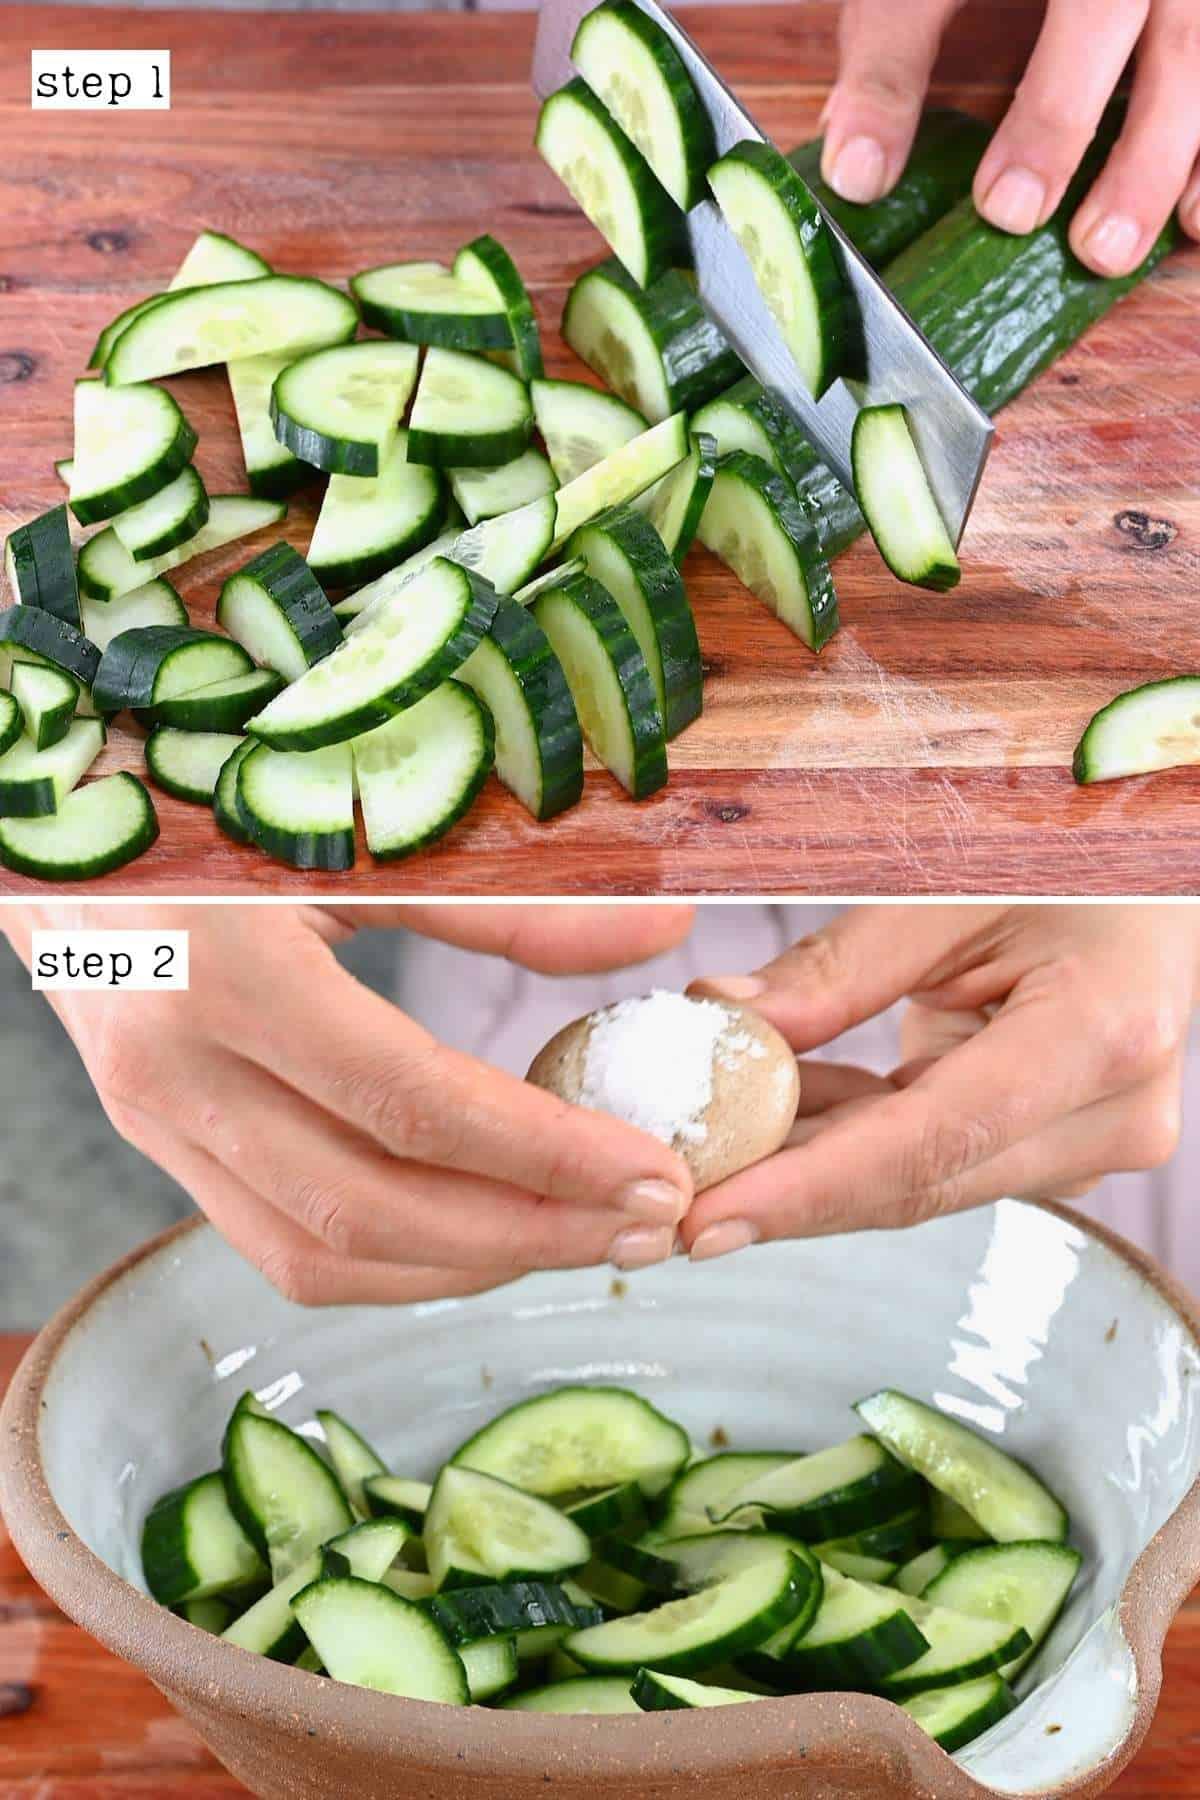 Cutting and salting cucumber